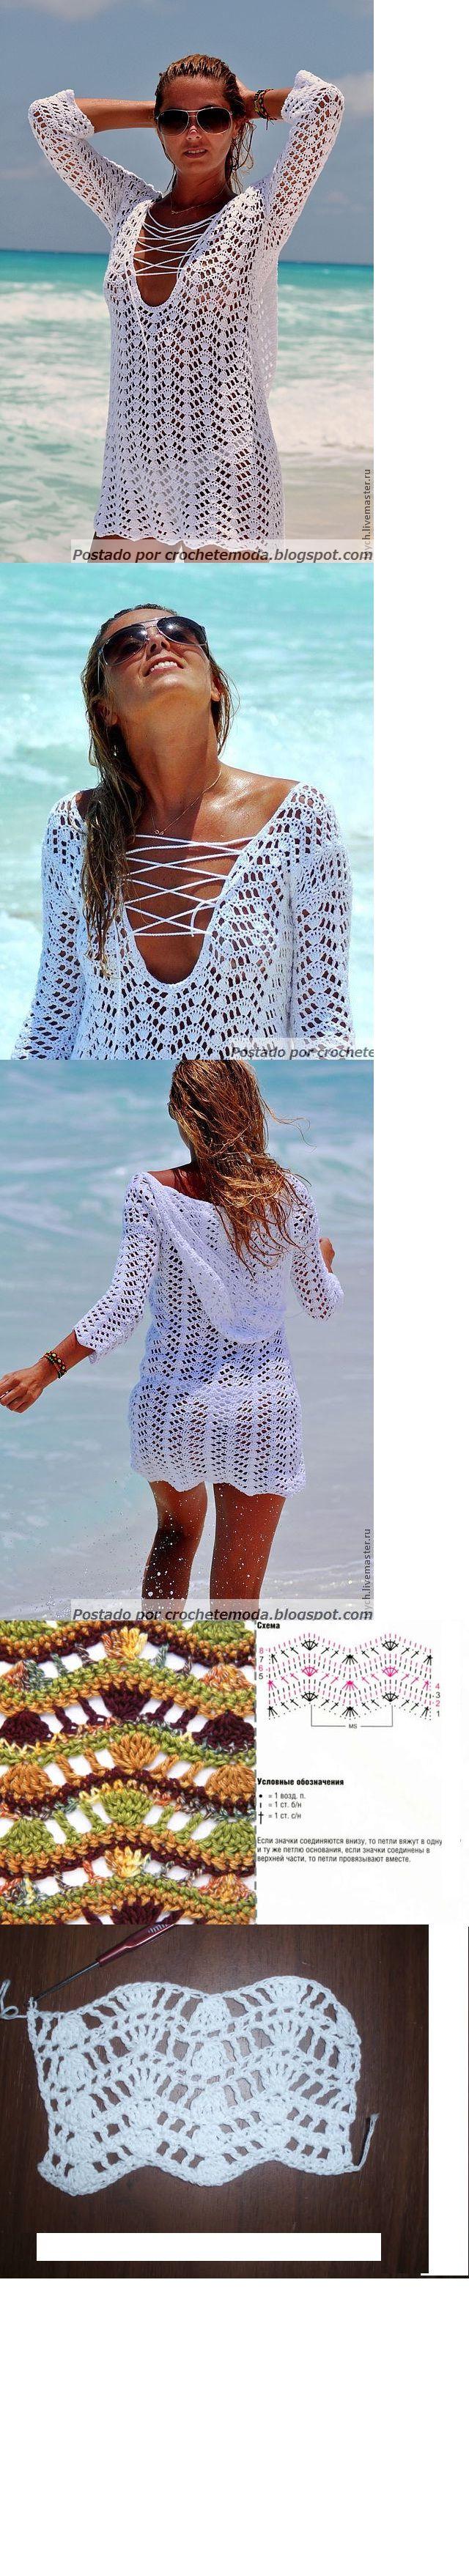 White Hoodie Beach Coverup free crochet graph pattern